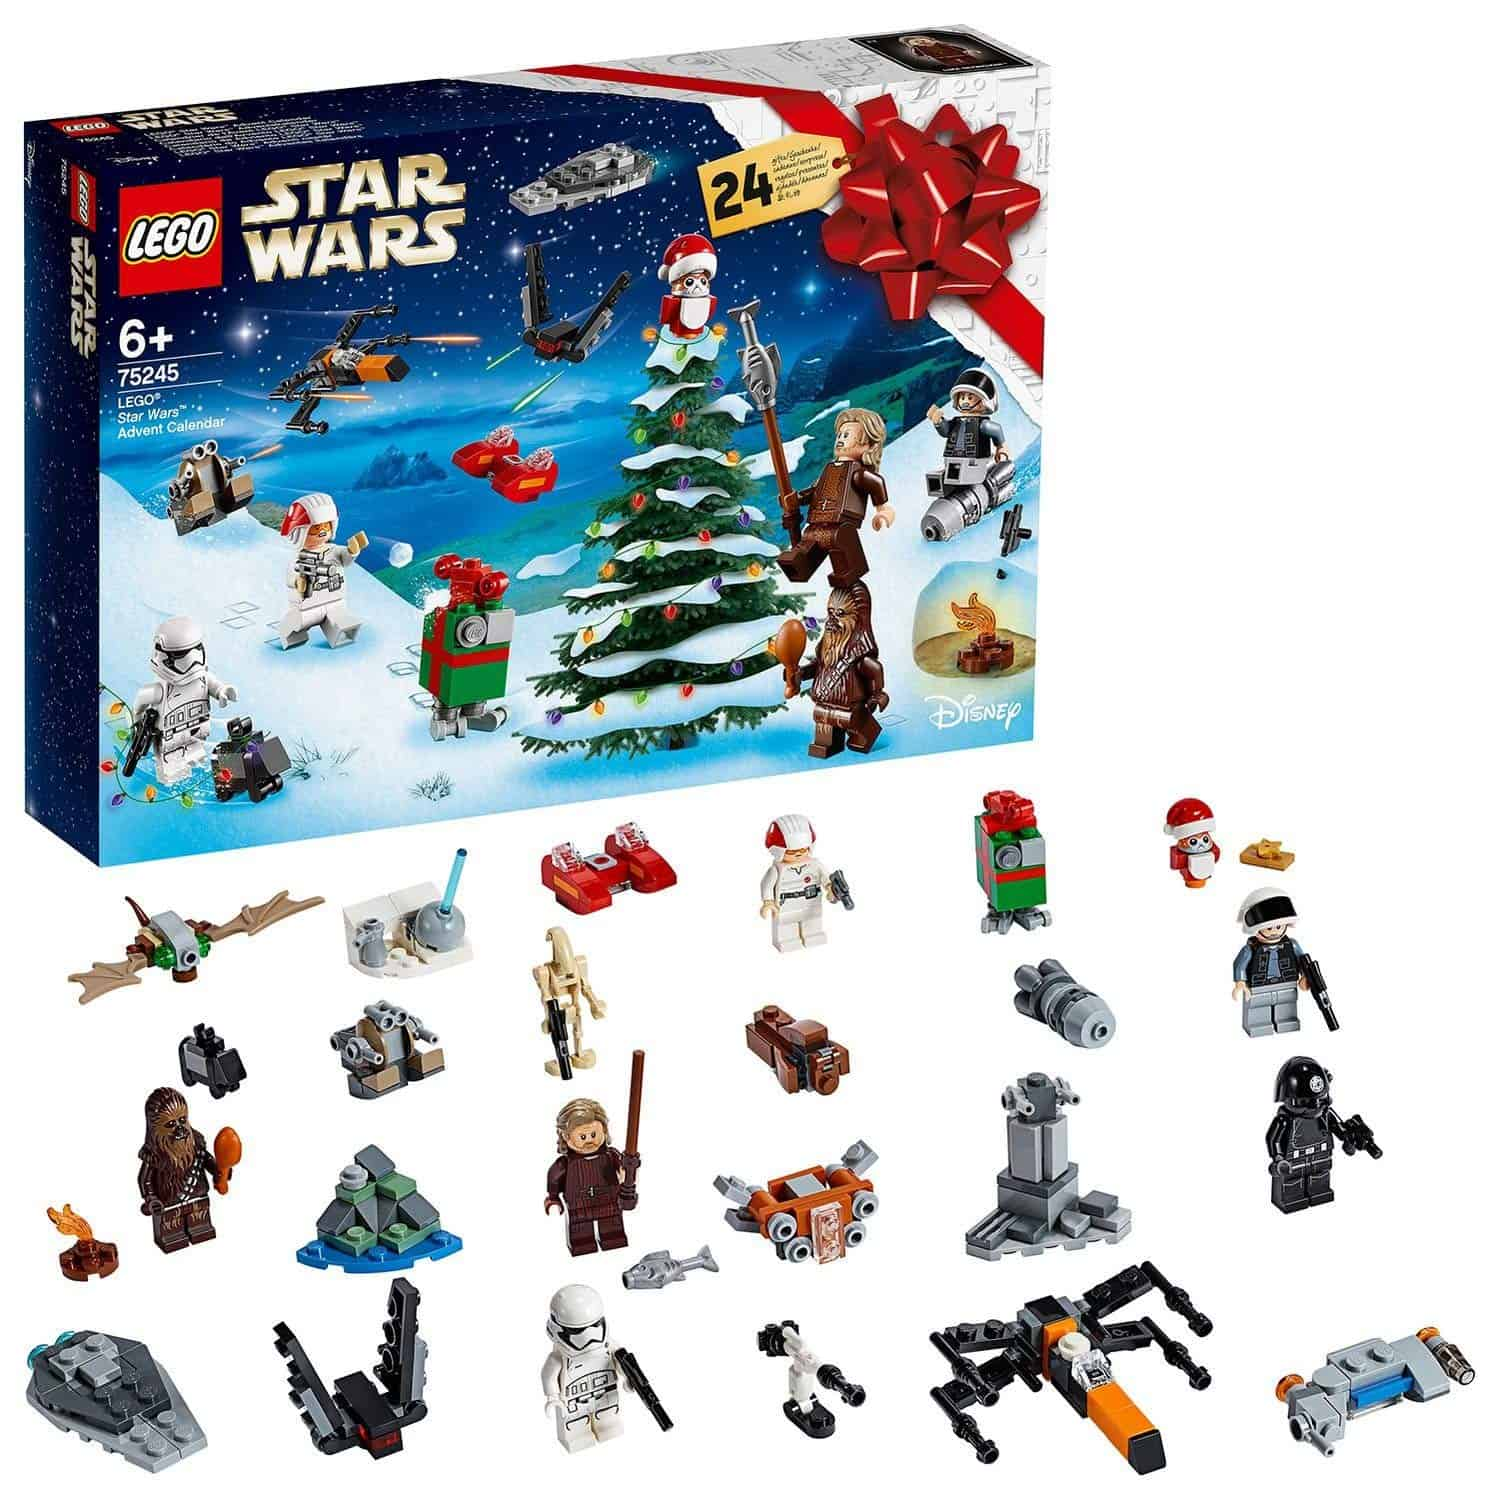 New Star Wars Lego Sets Christmas 2020 5 Best Lego Advent Calendars UK Edition [2020]   WhatKids